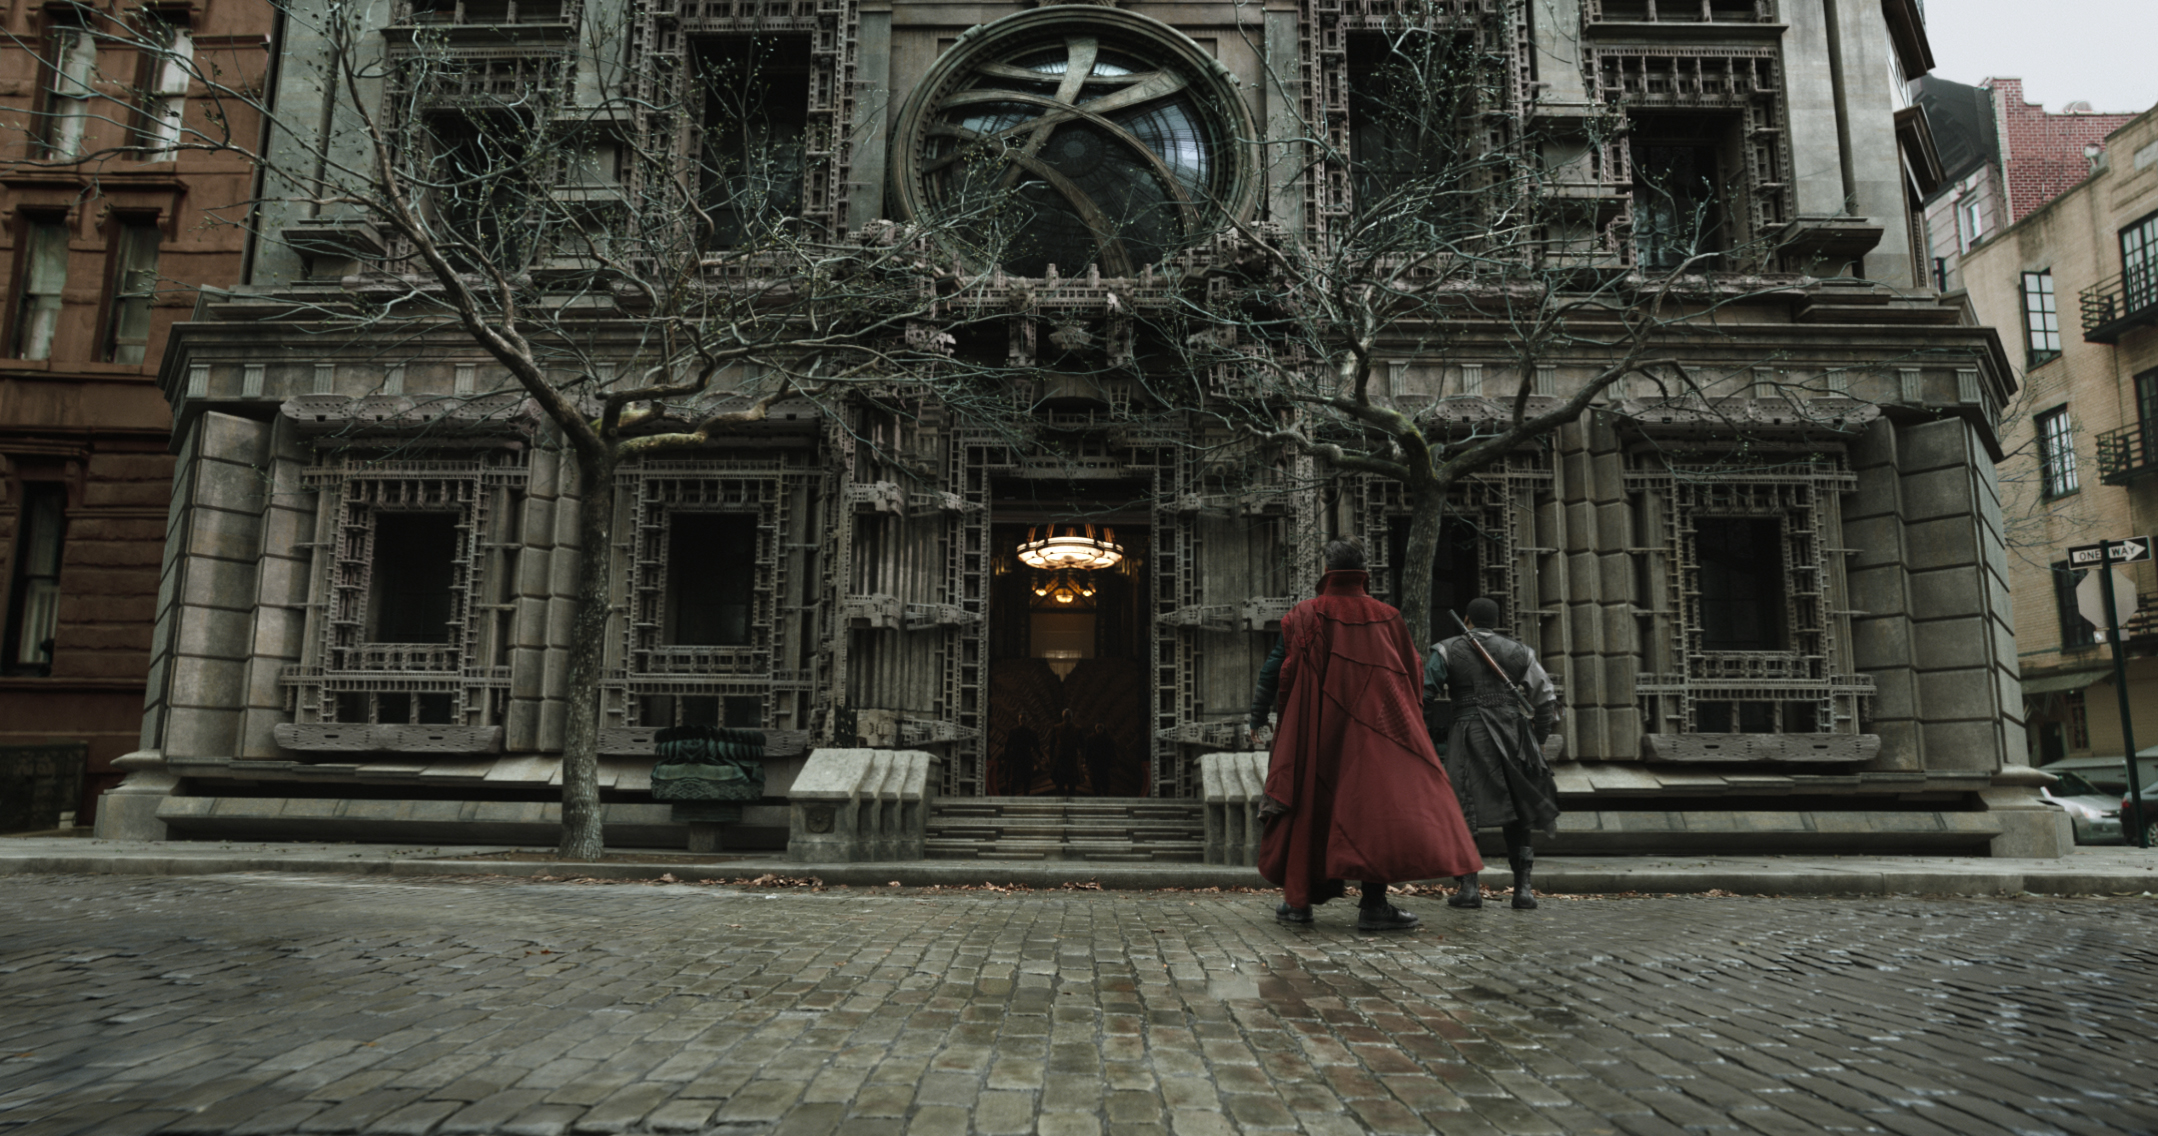 Marvel's DOCTOR STRANGE..L to R: Doctor Stephen Strange (Benedict Cumberbatch) and Mordo (Chiwetel Ejiofor) outside the New York City Sanctum Sanctorum...Photo Credit: Film Frame ..©2016 Marvel. All Rights Reserved.